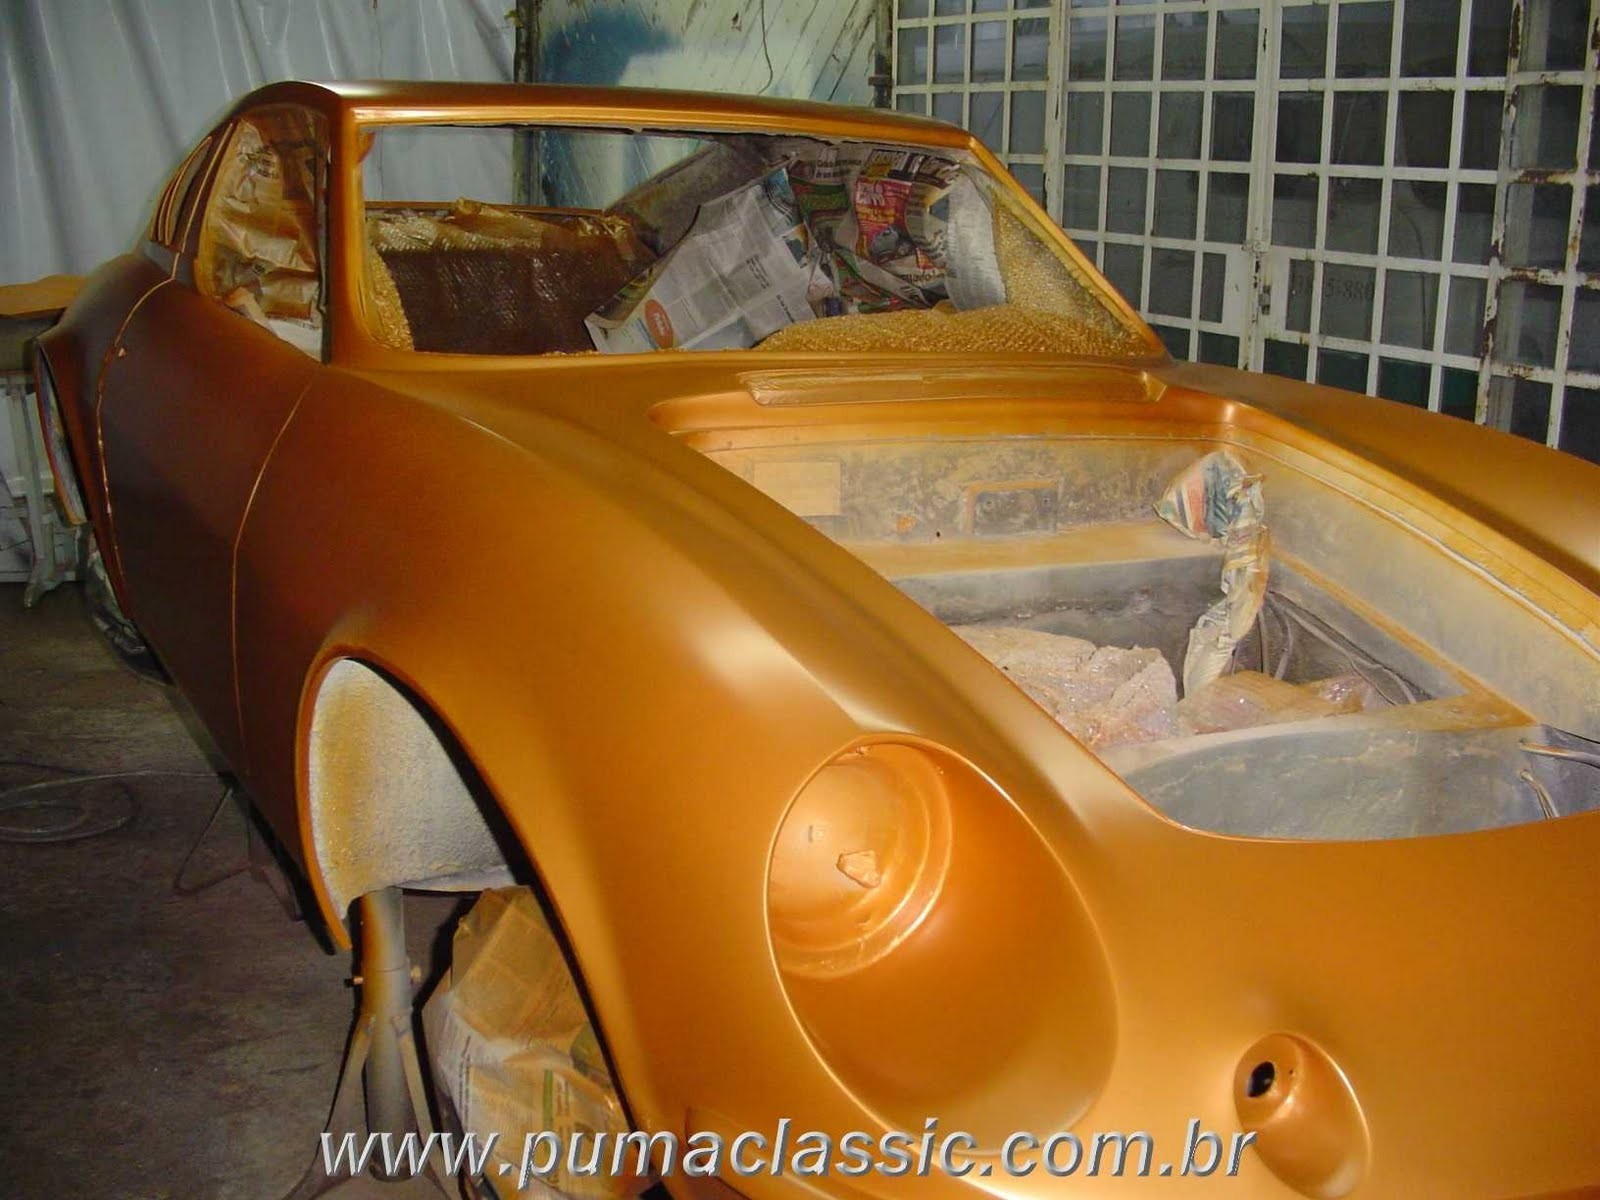 Puma GTE 1975 (2) - A